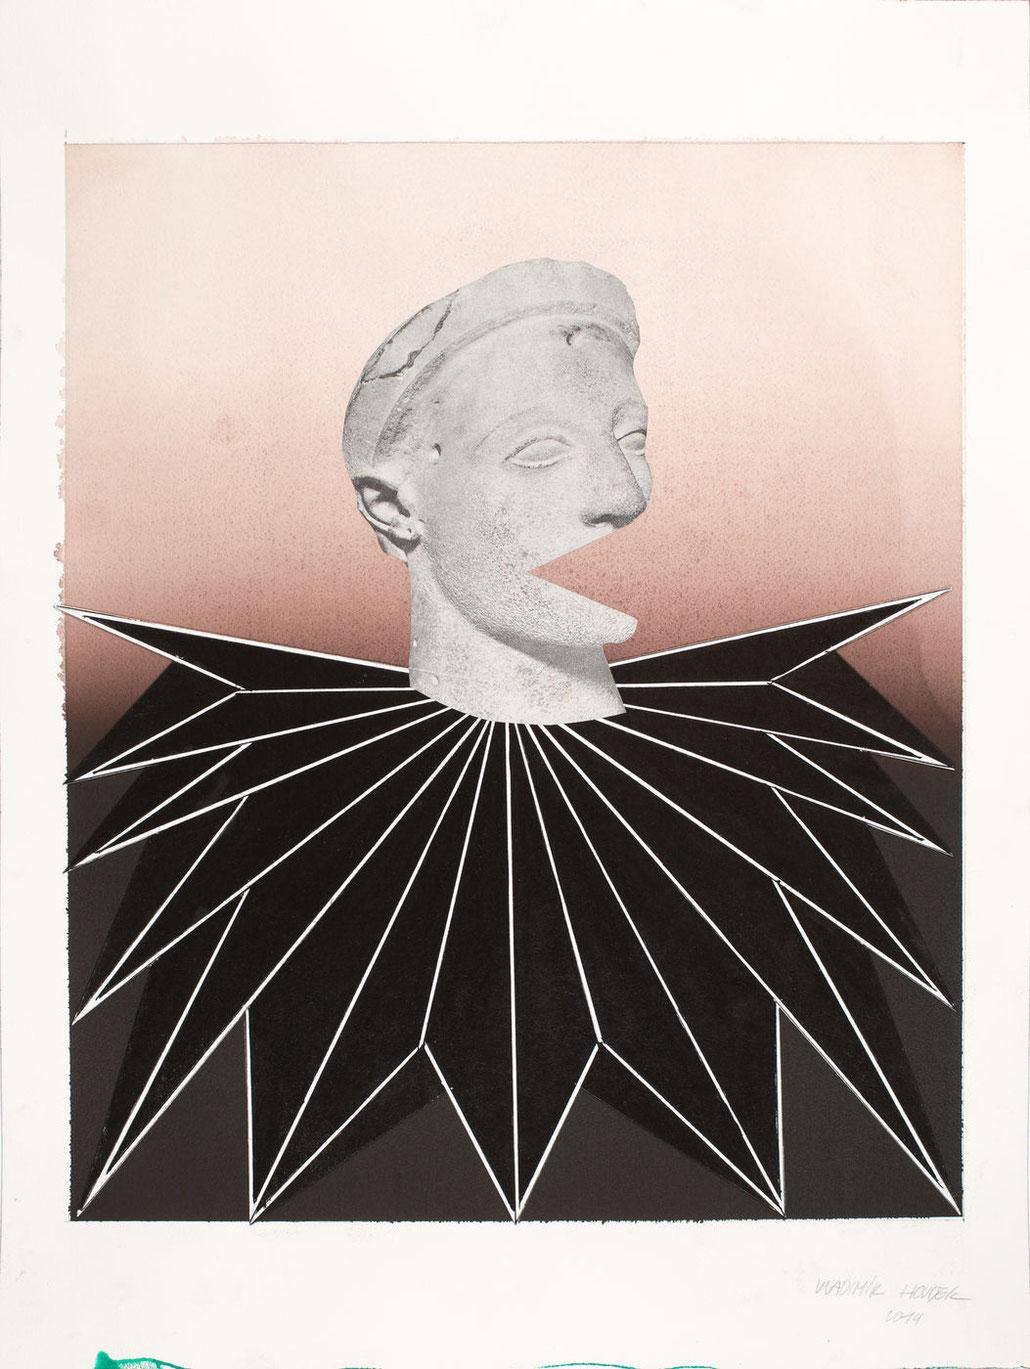 Vlidimir Houdek art original artwork by the czech contemporary artist Vladimir Houdek